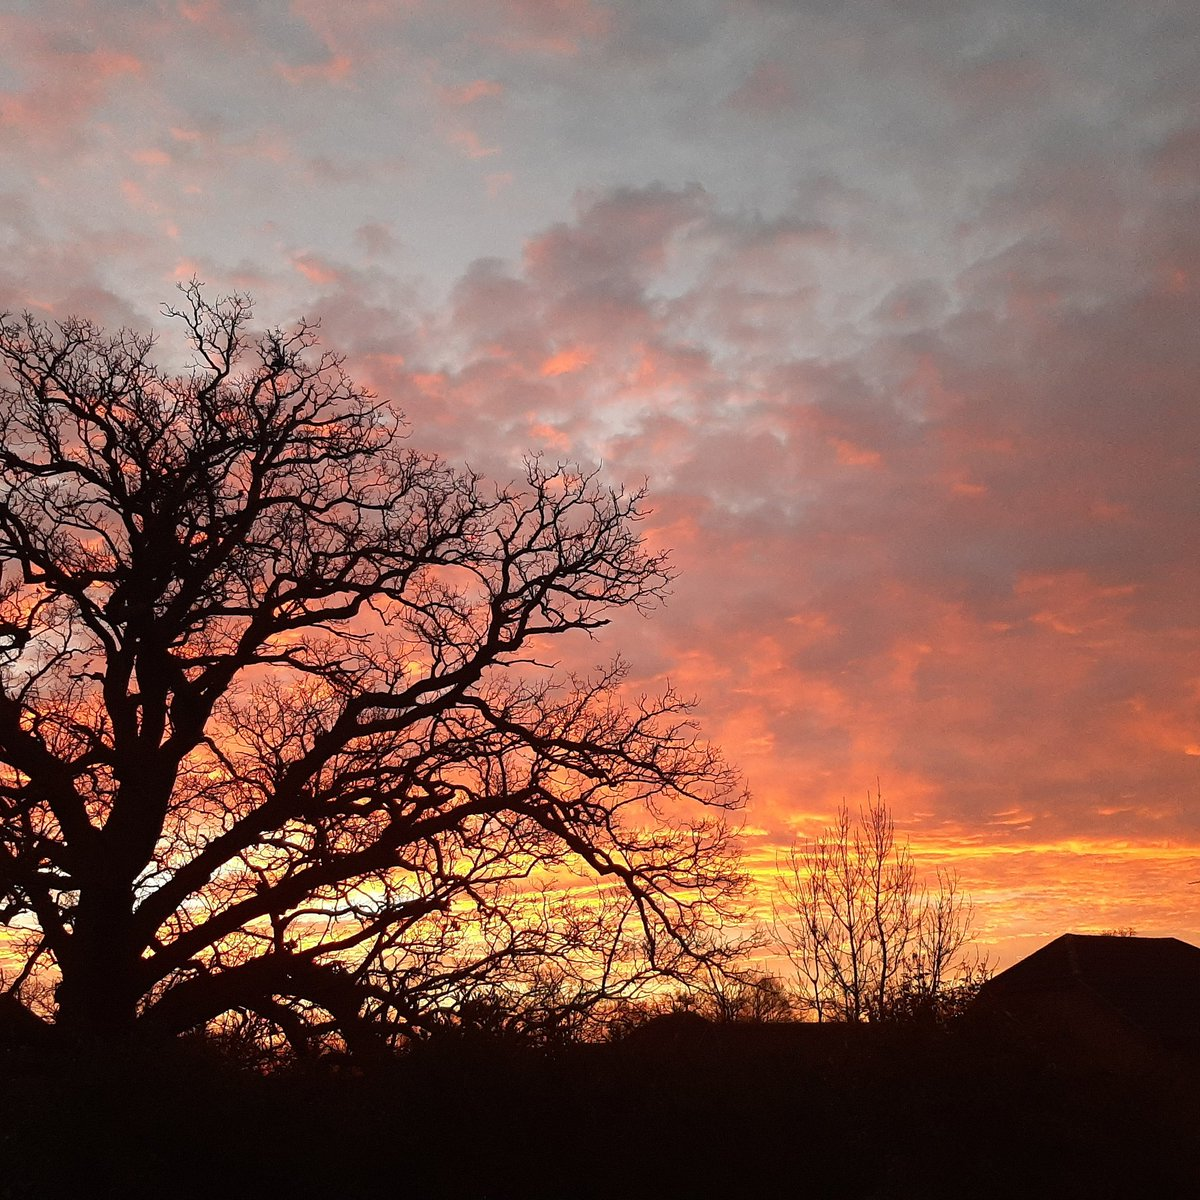 Can't beat a pretty start to the day!  @BBCWthrWatchers @BBCSouthWeather @bbcweather @AlexisGreenTV #bbcweatherwatchers #berkshire #sunrise #tuesdaymorning #tuesdaymotivations #myweather